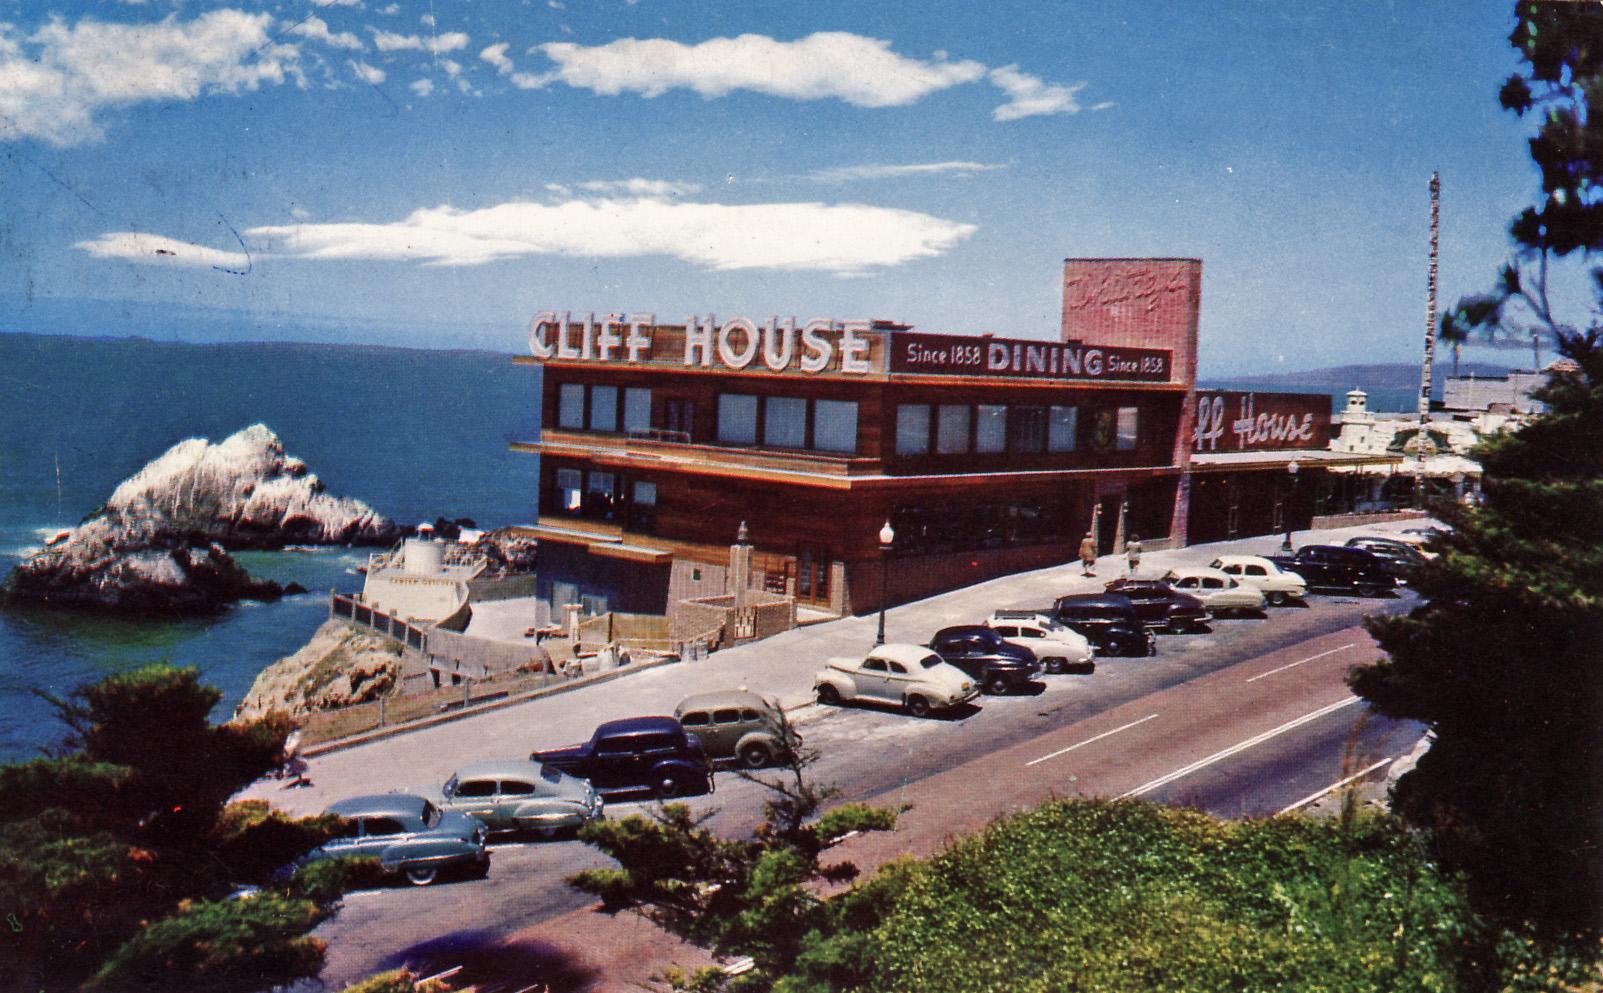 Clift House Hotel San Francisco